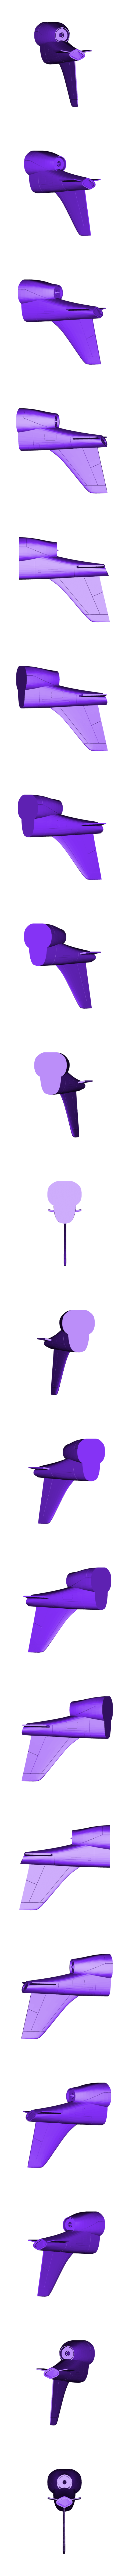 parte1.stl Download STL file IA-63 Pampa • 3D print object, Nico_3D